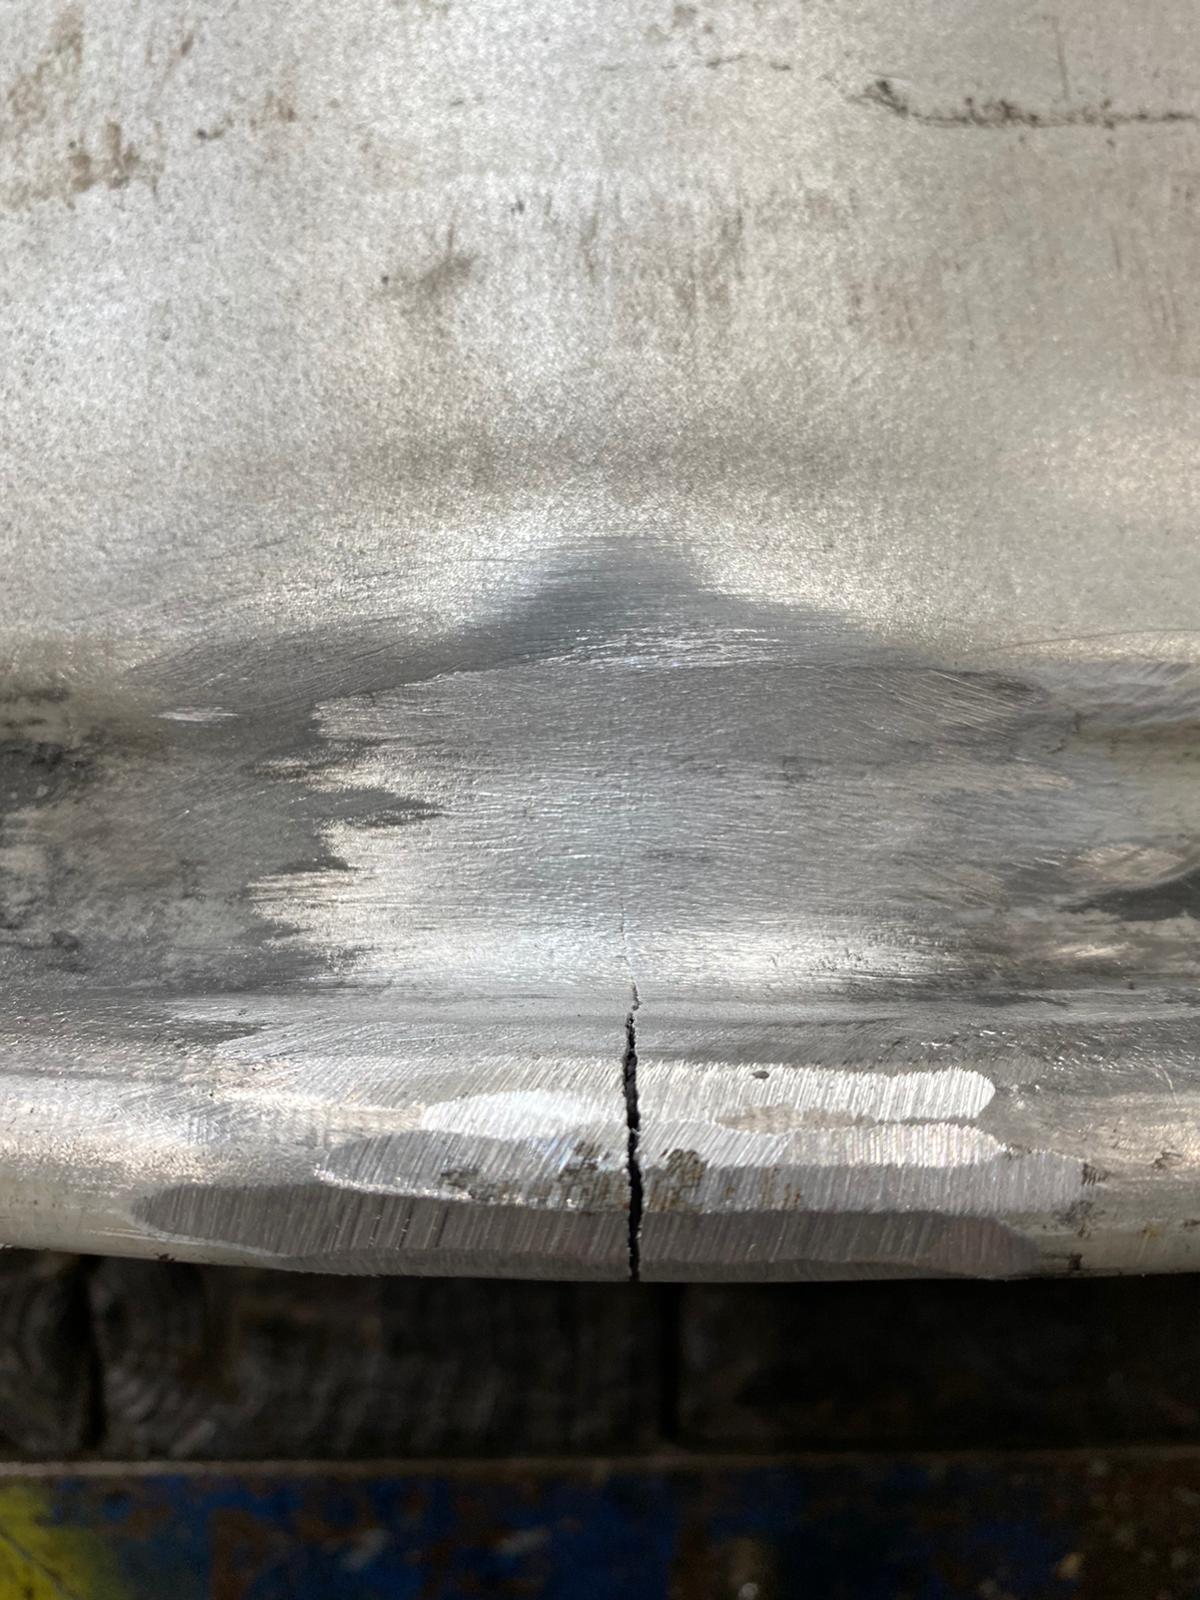 Cracked Alloy Wheel Repair